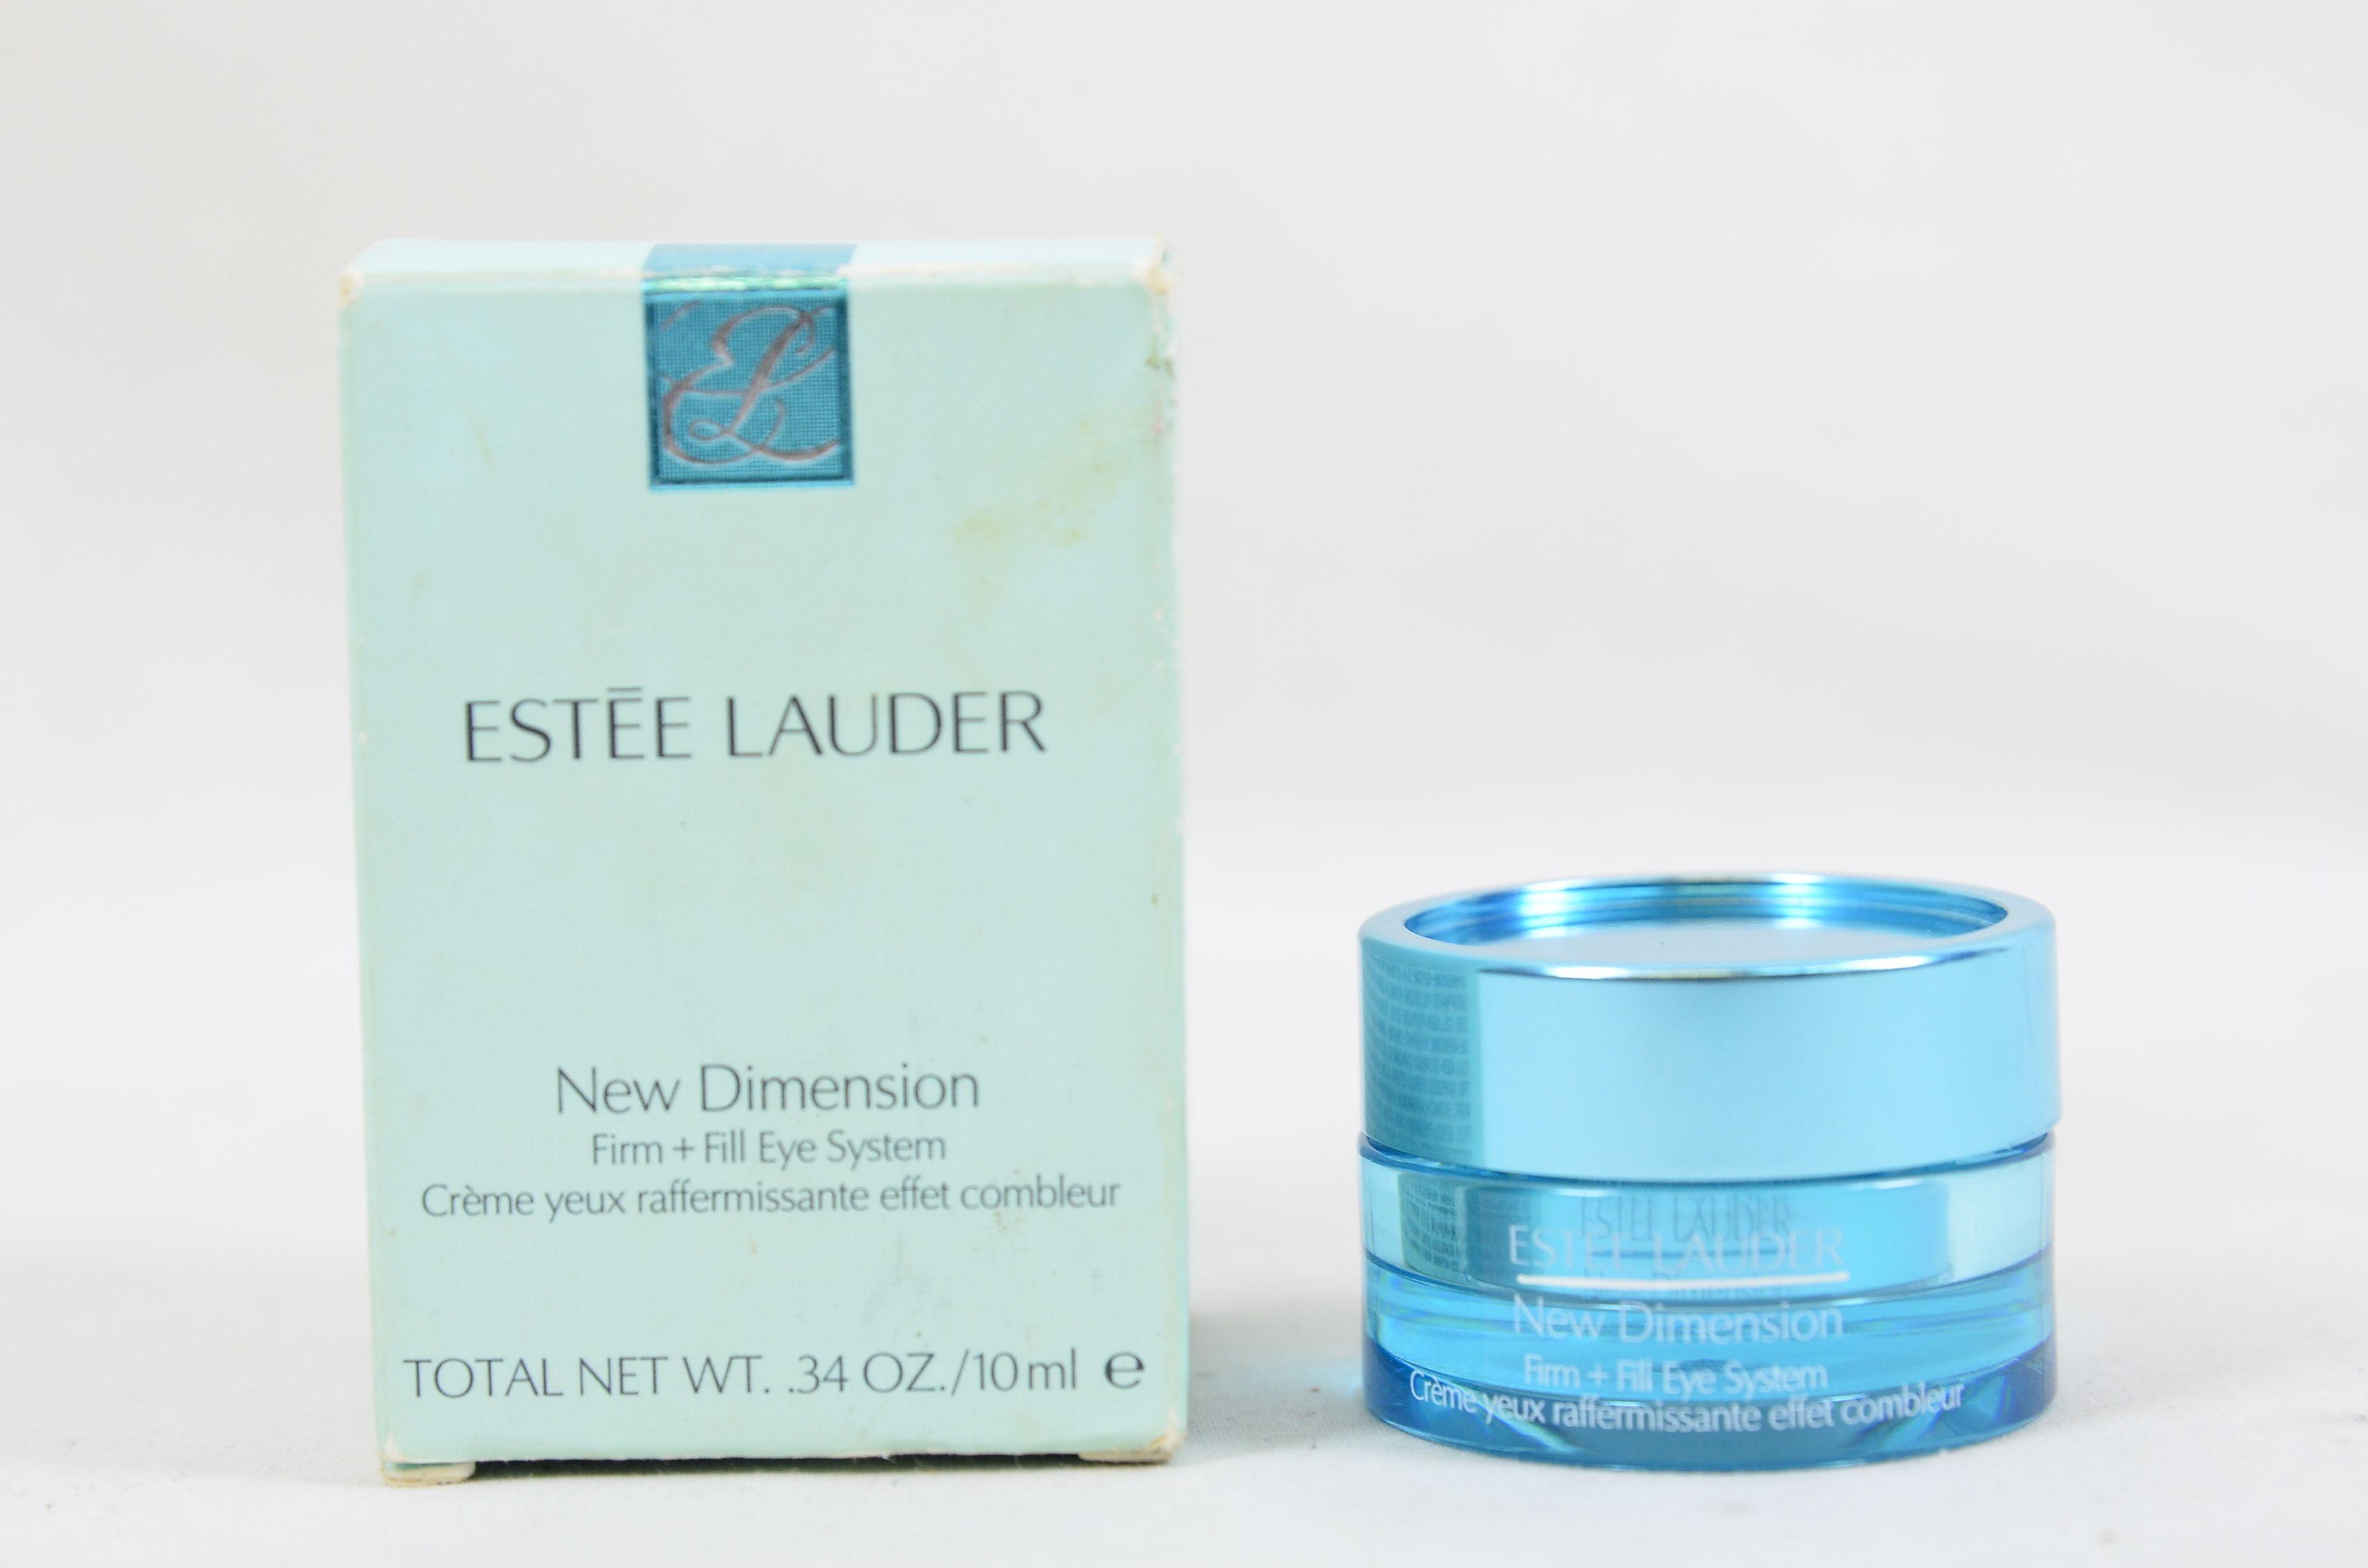 Estee Lauder New Dimension Firm + Fill Eye System 10ml Thumbnail 1